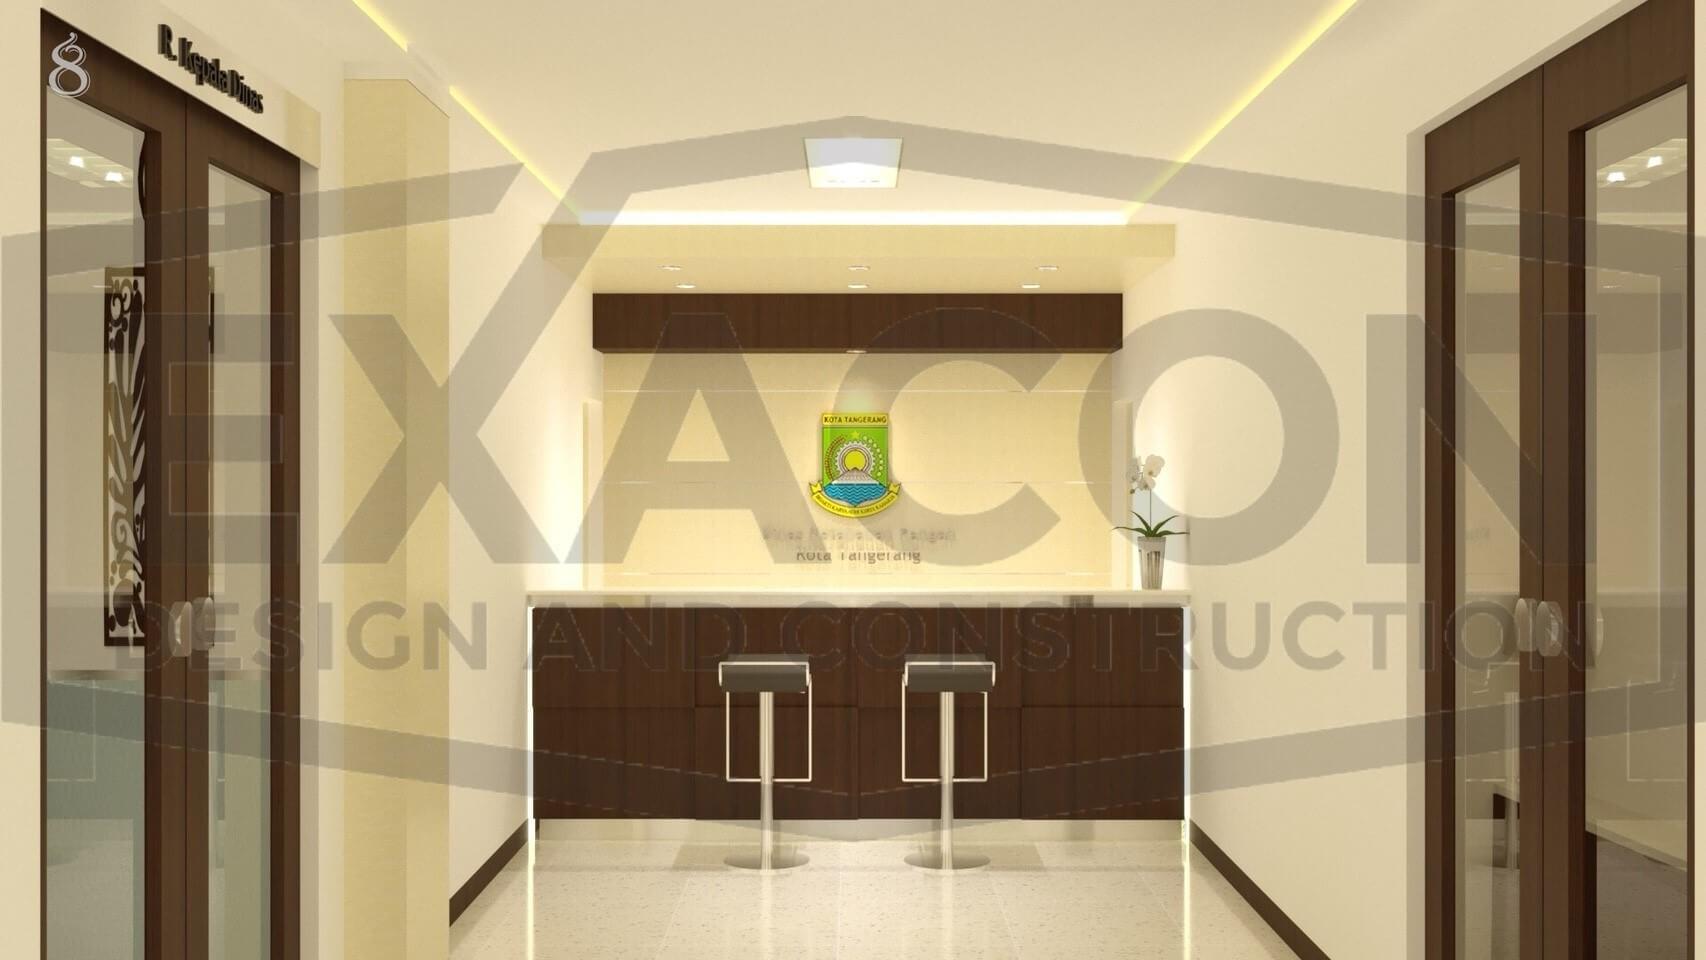 Proyek Desain Interior Kantor Dinas Ketahanan Pangan Dan Pertanian Tangerang